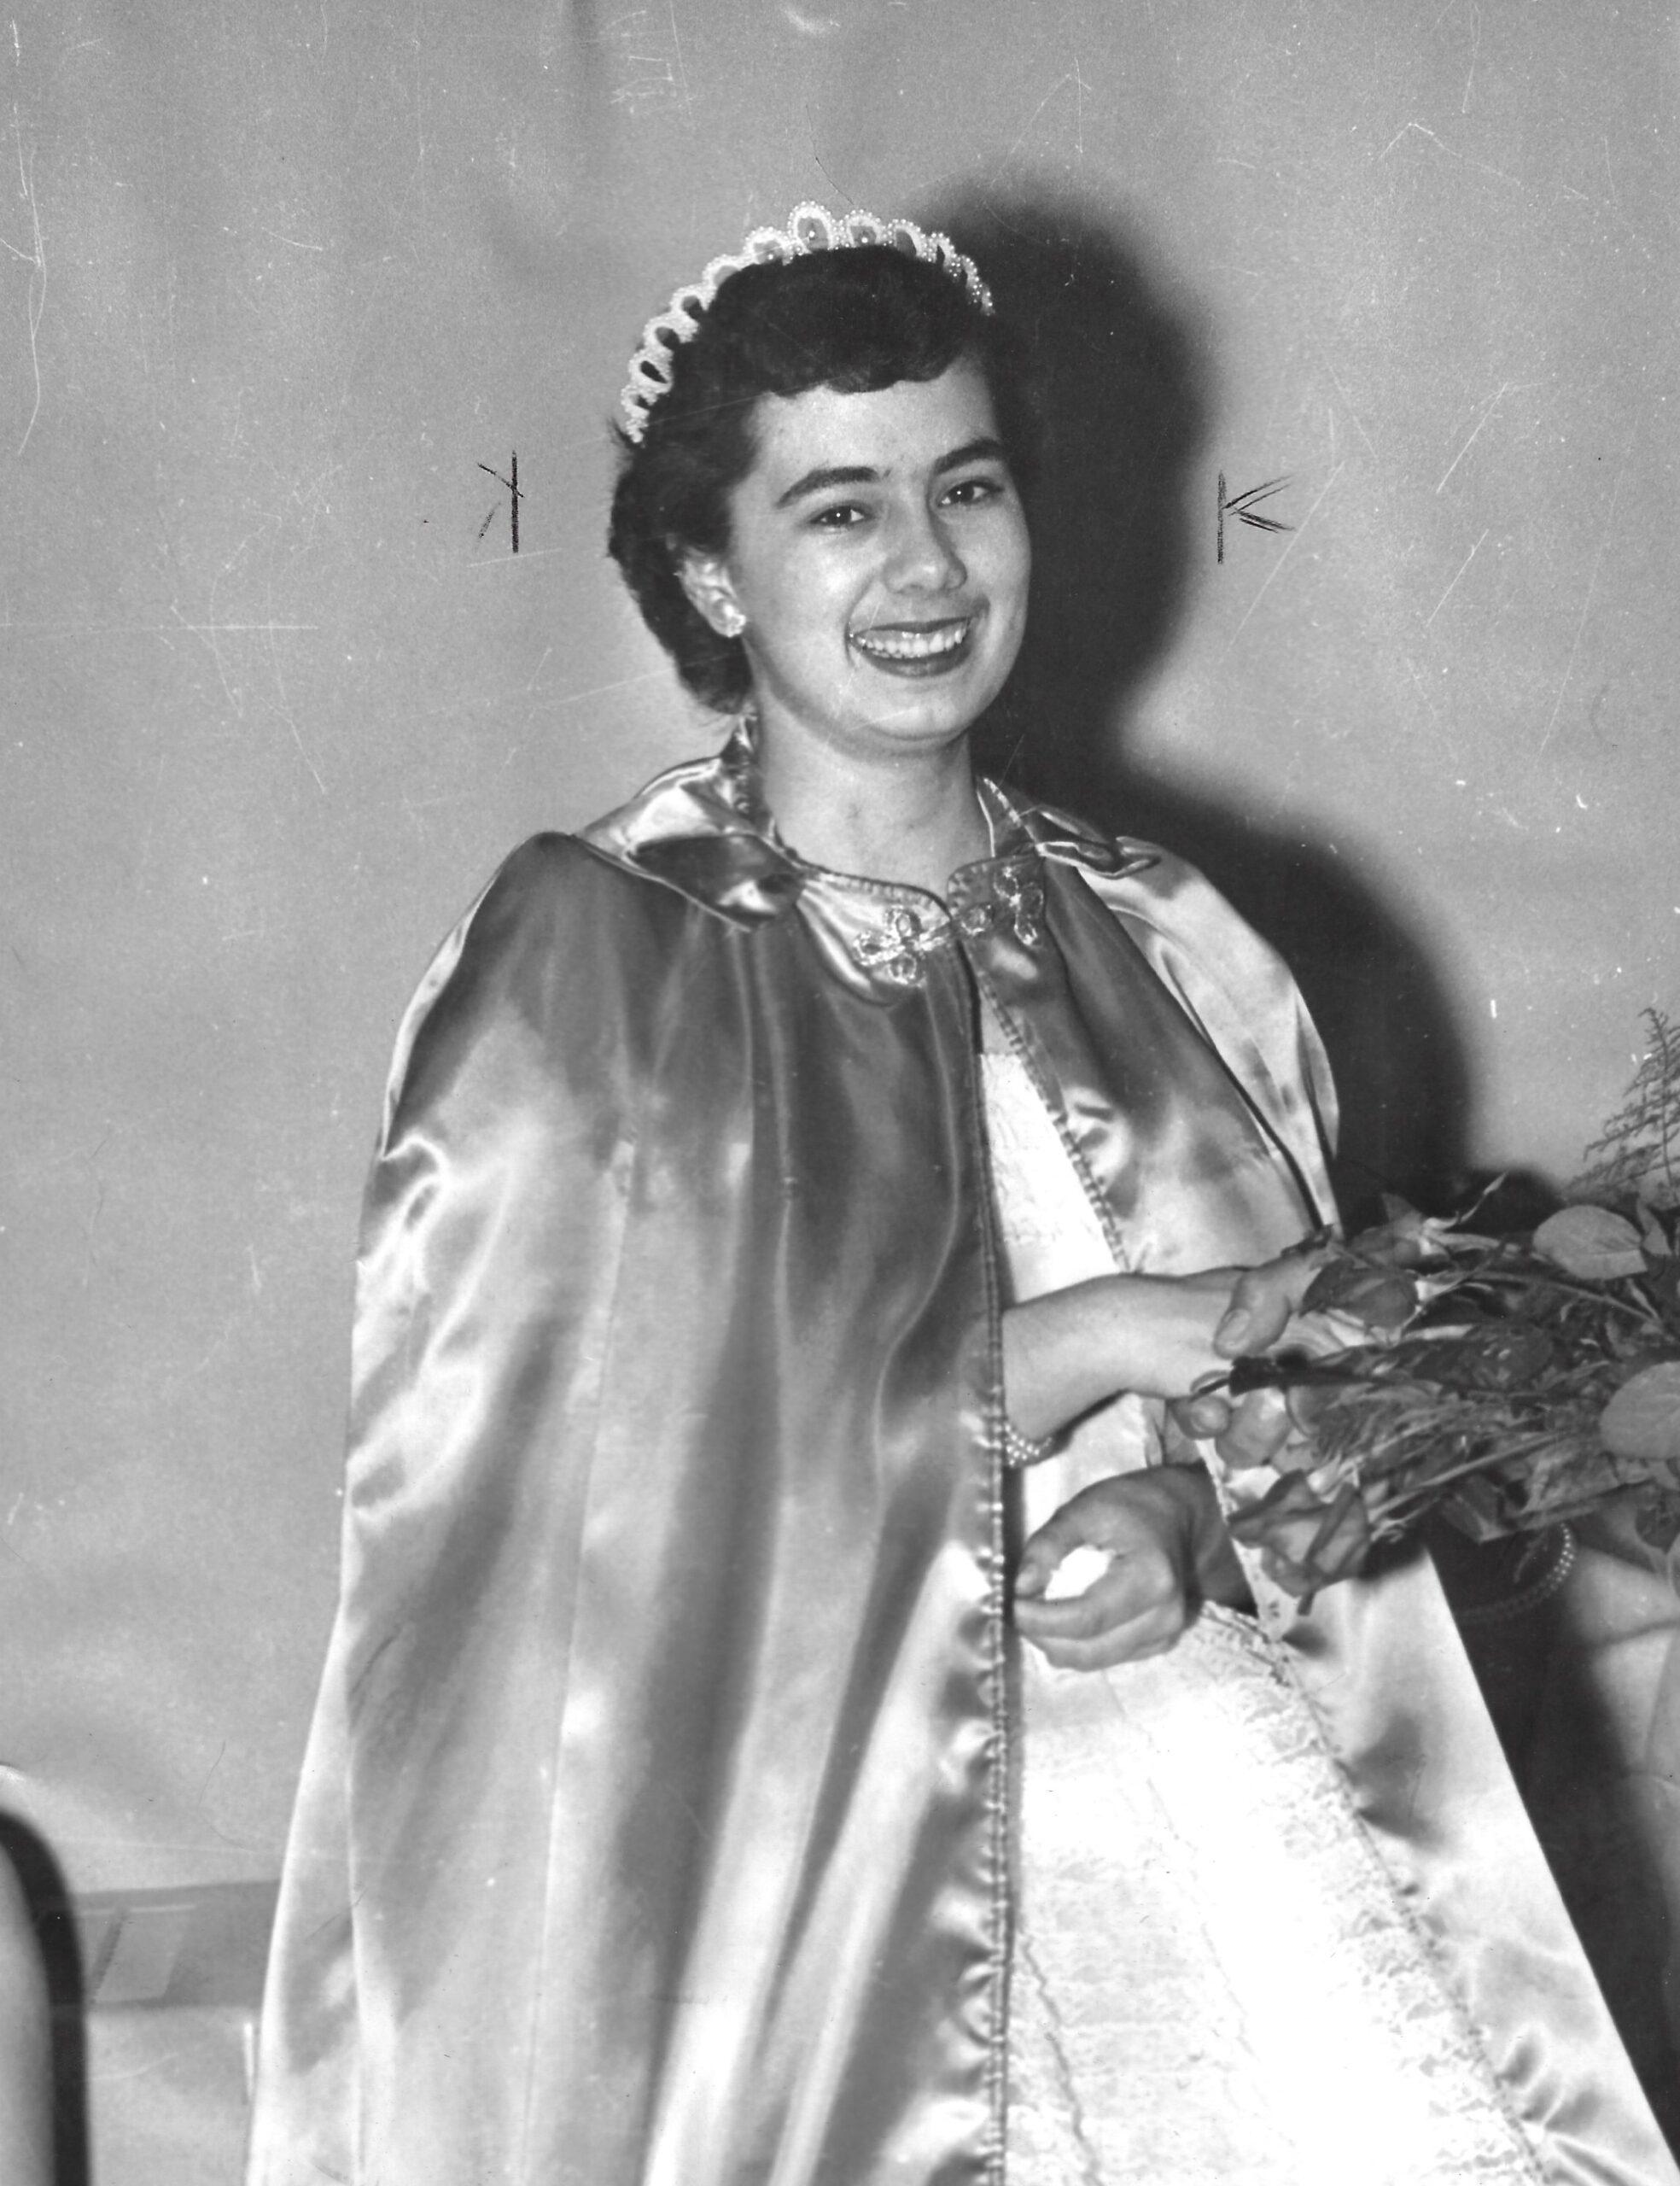 1957 Lincoln County Fair Queen